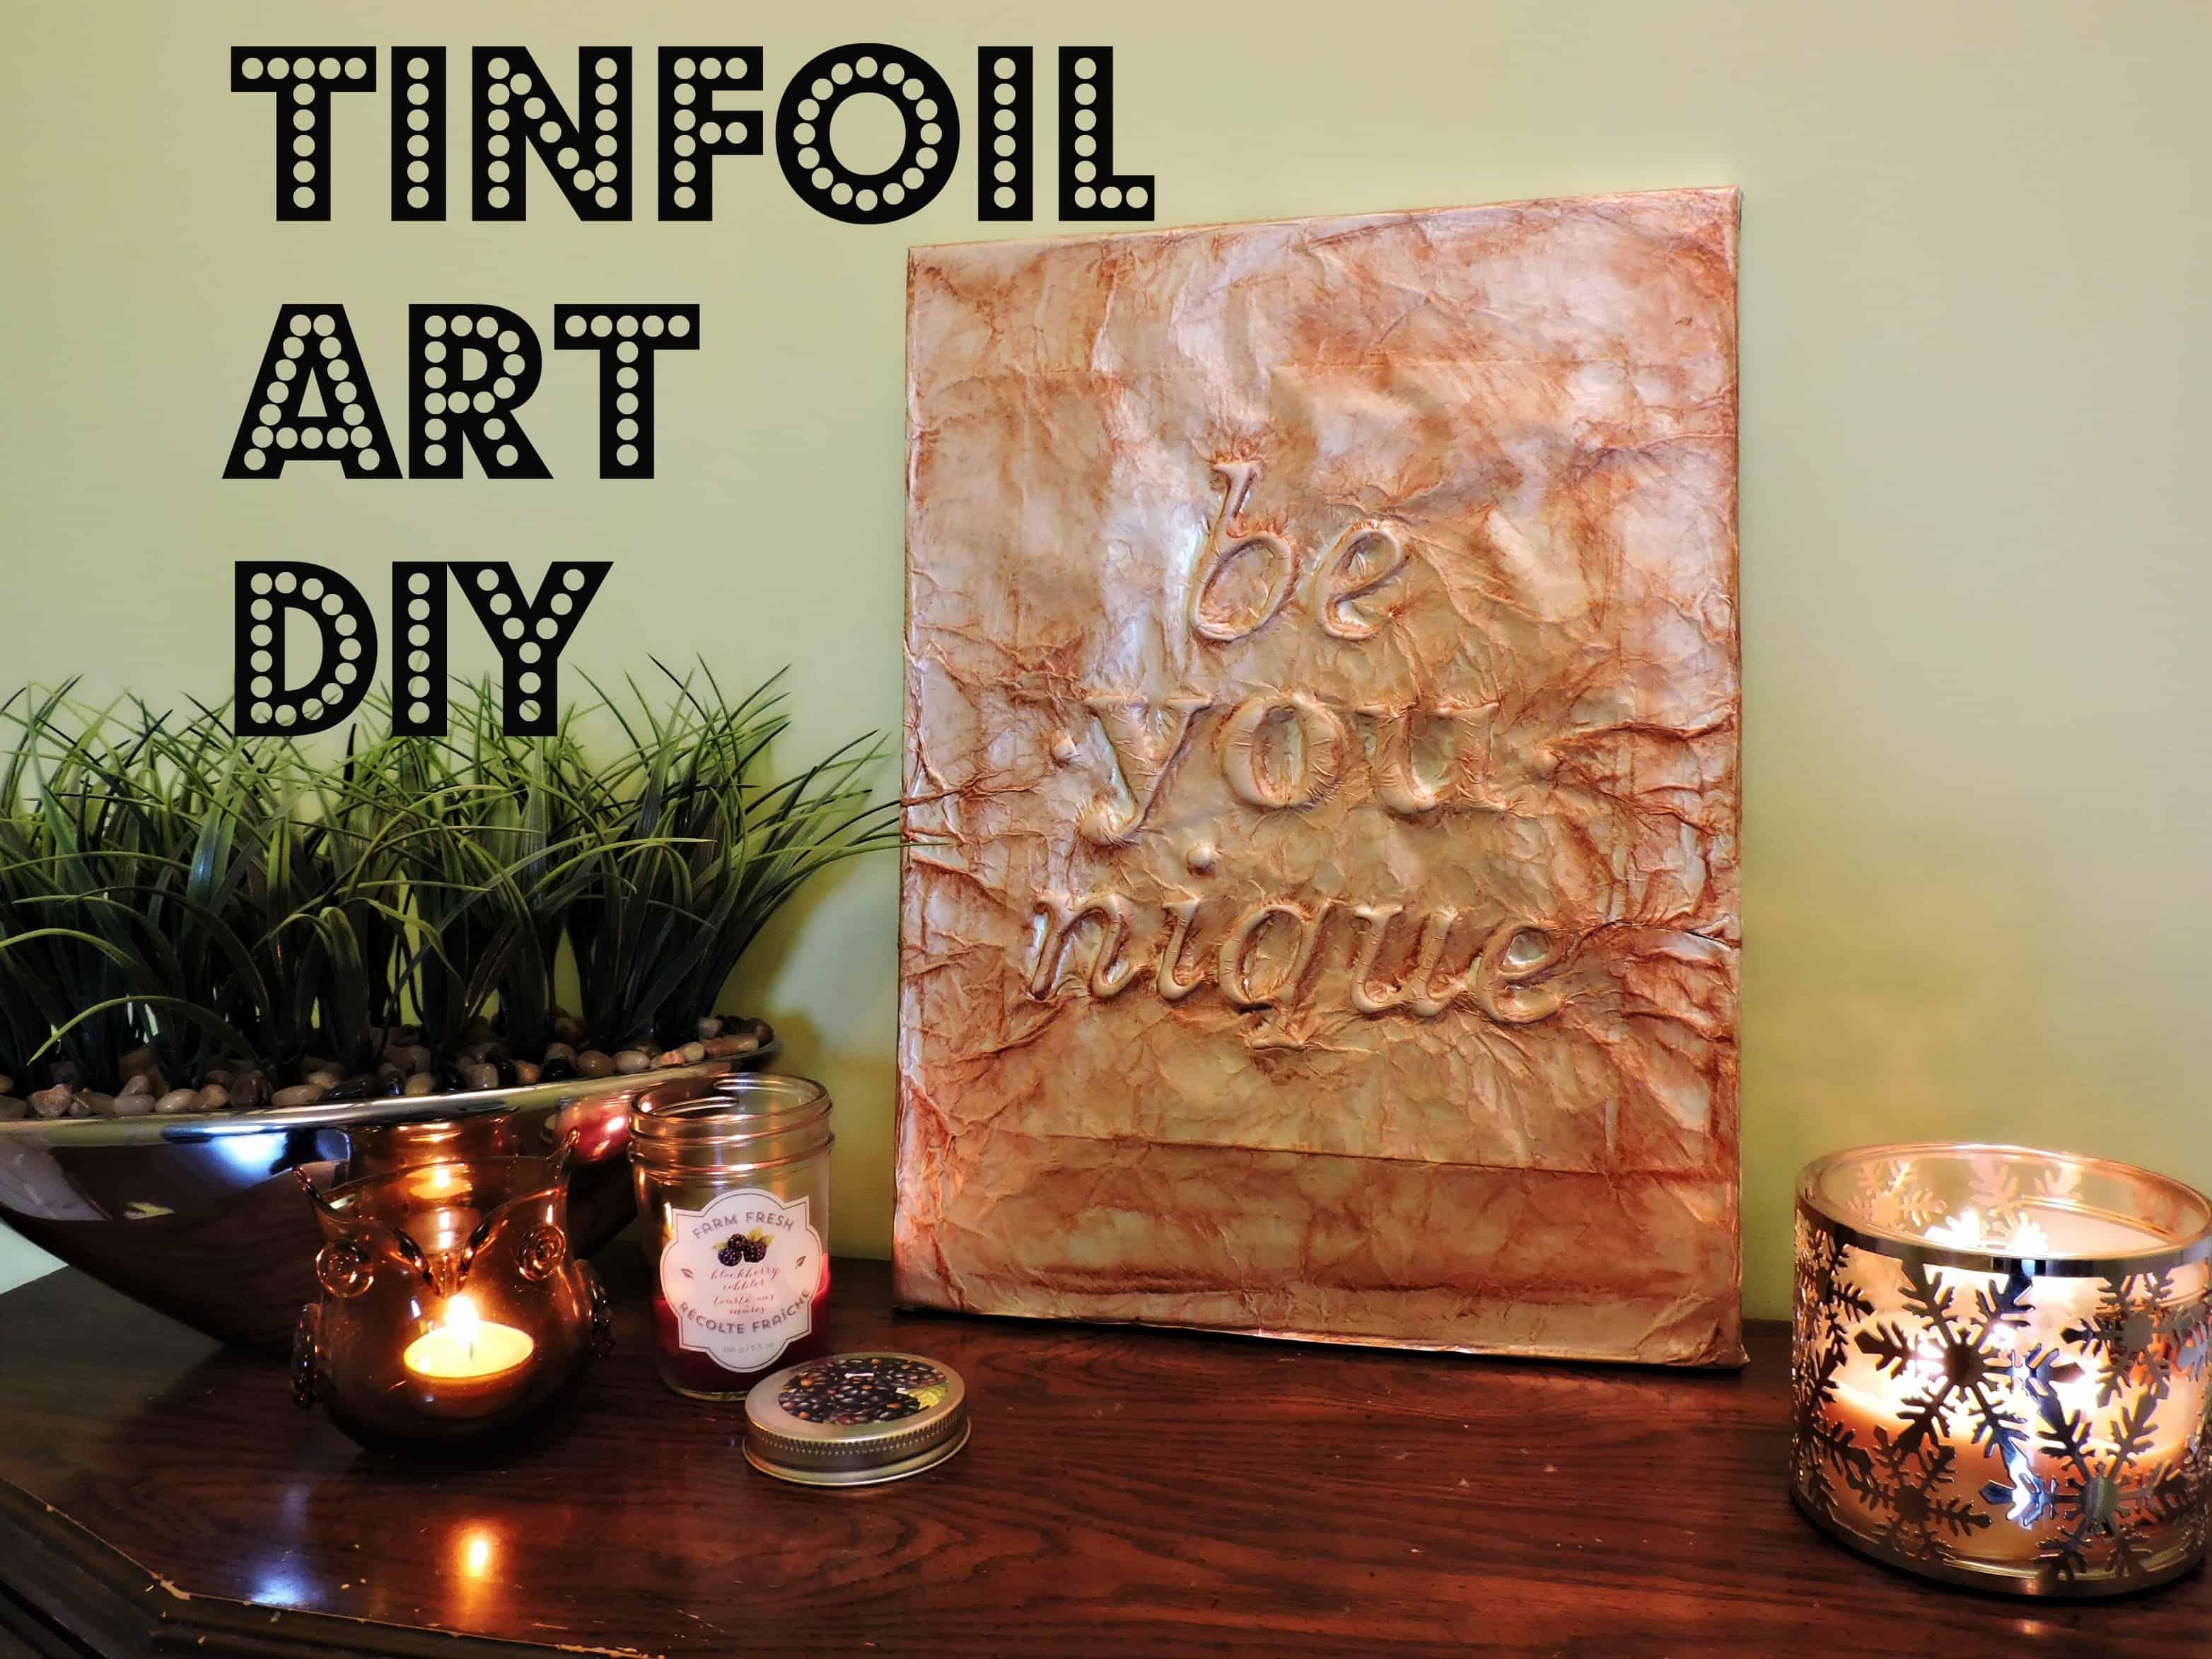 Tin foil quote art